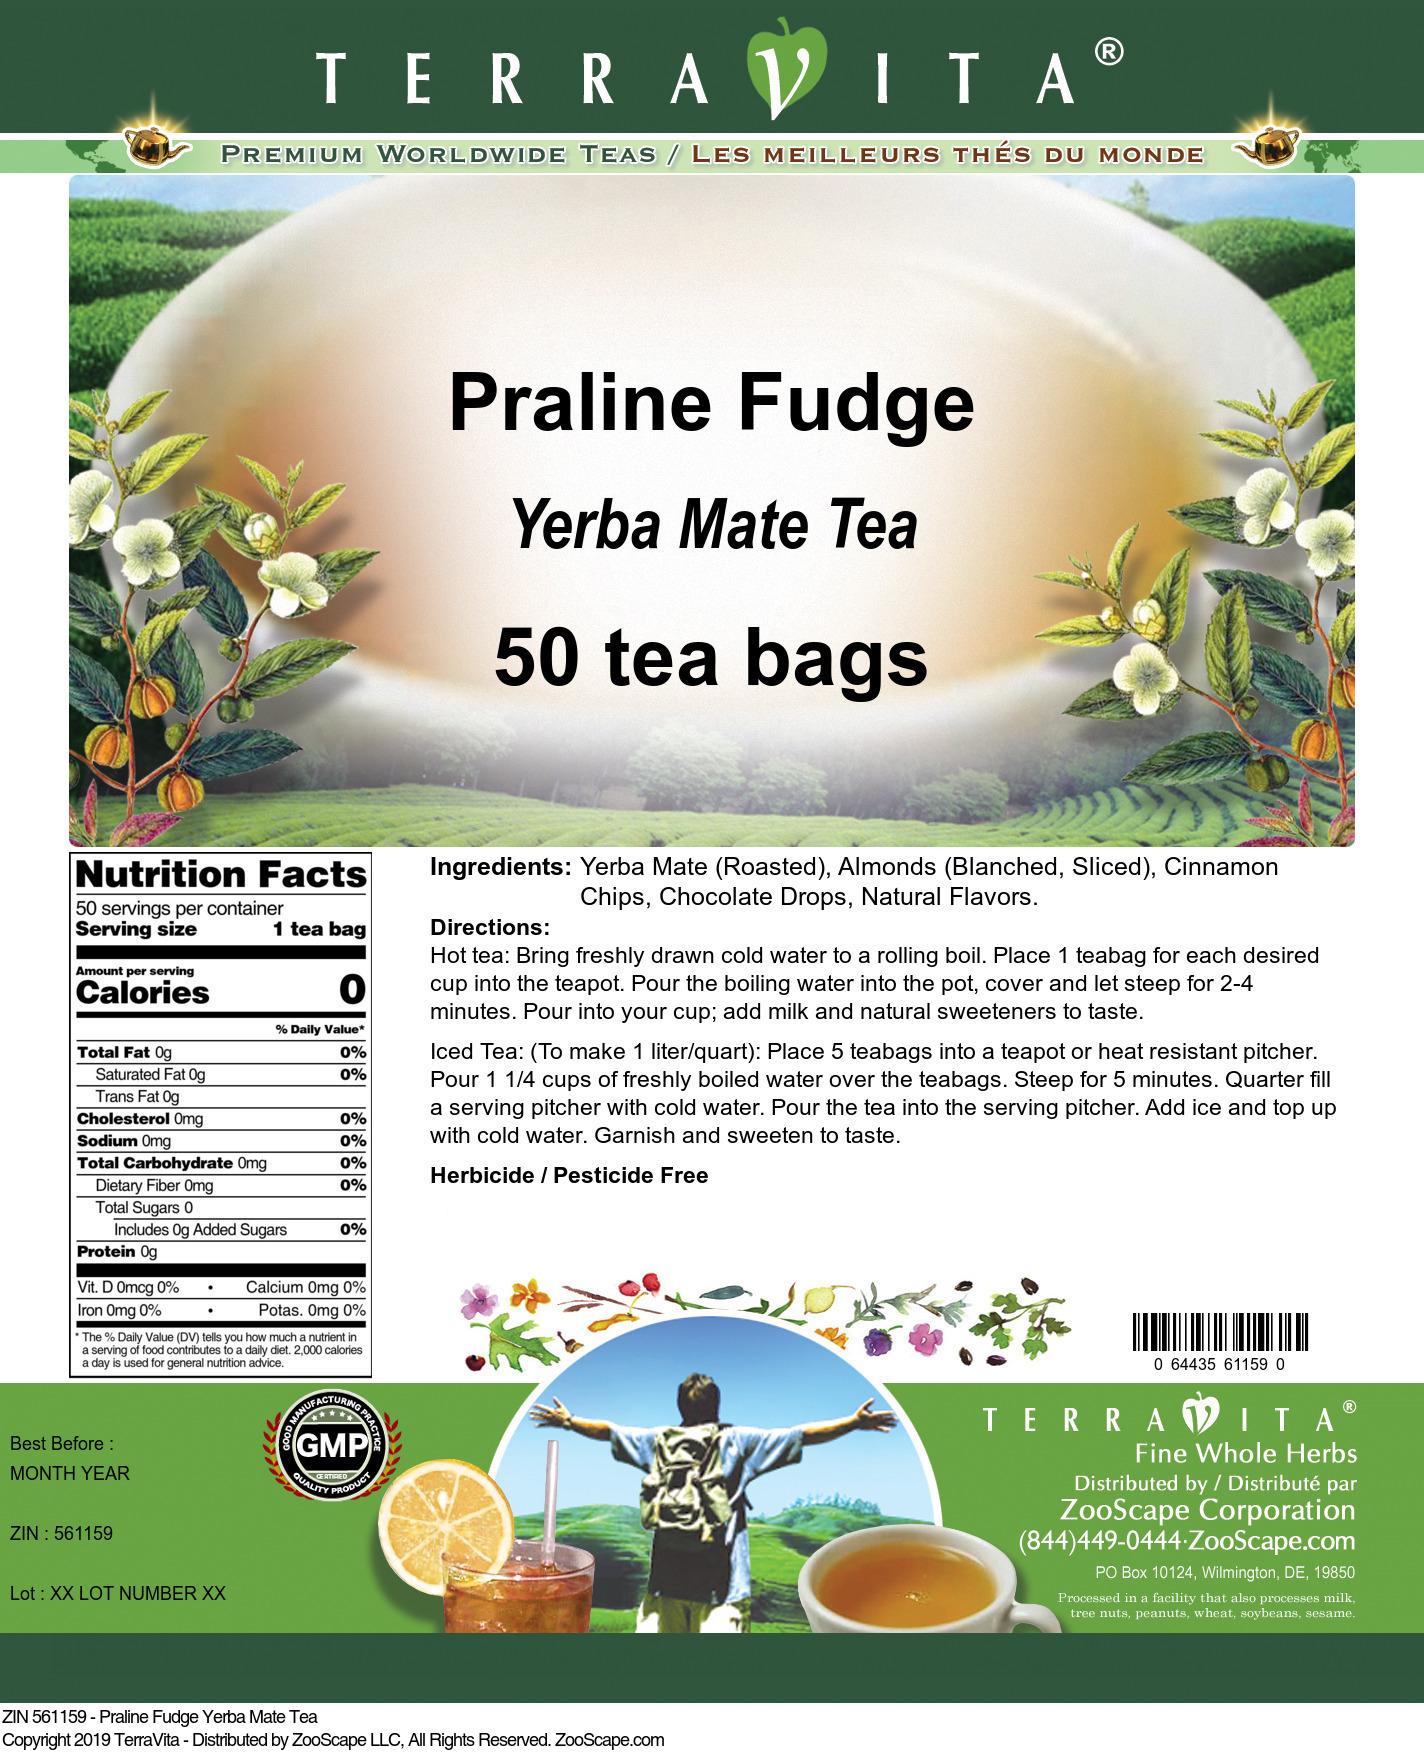 Praline Fudge Yerba Mate Tea